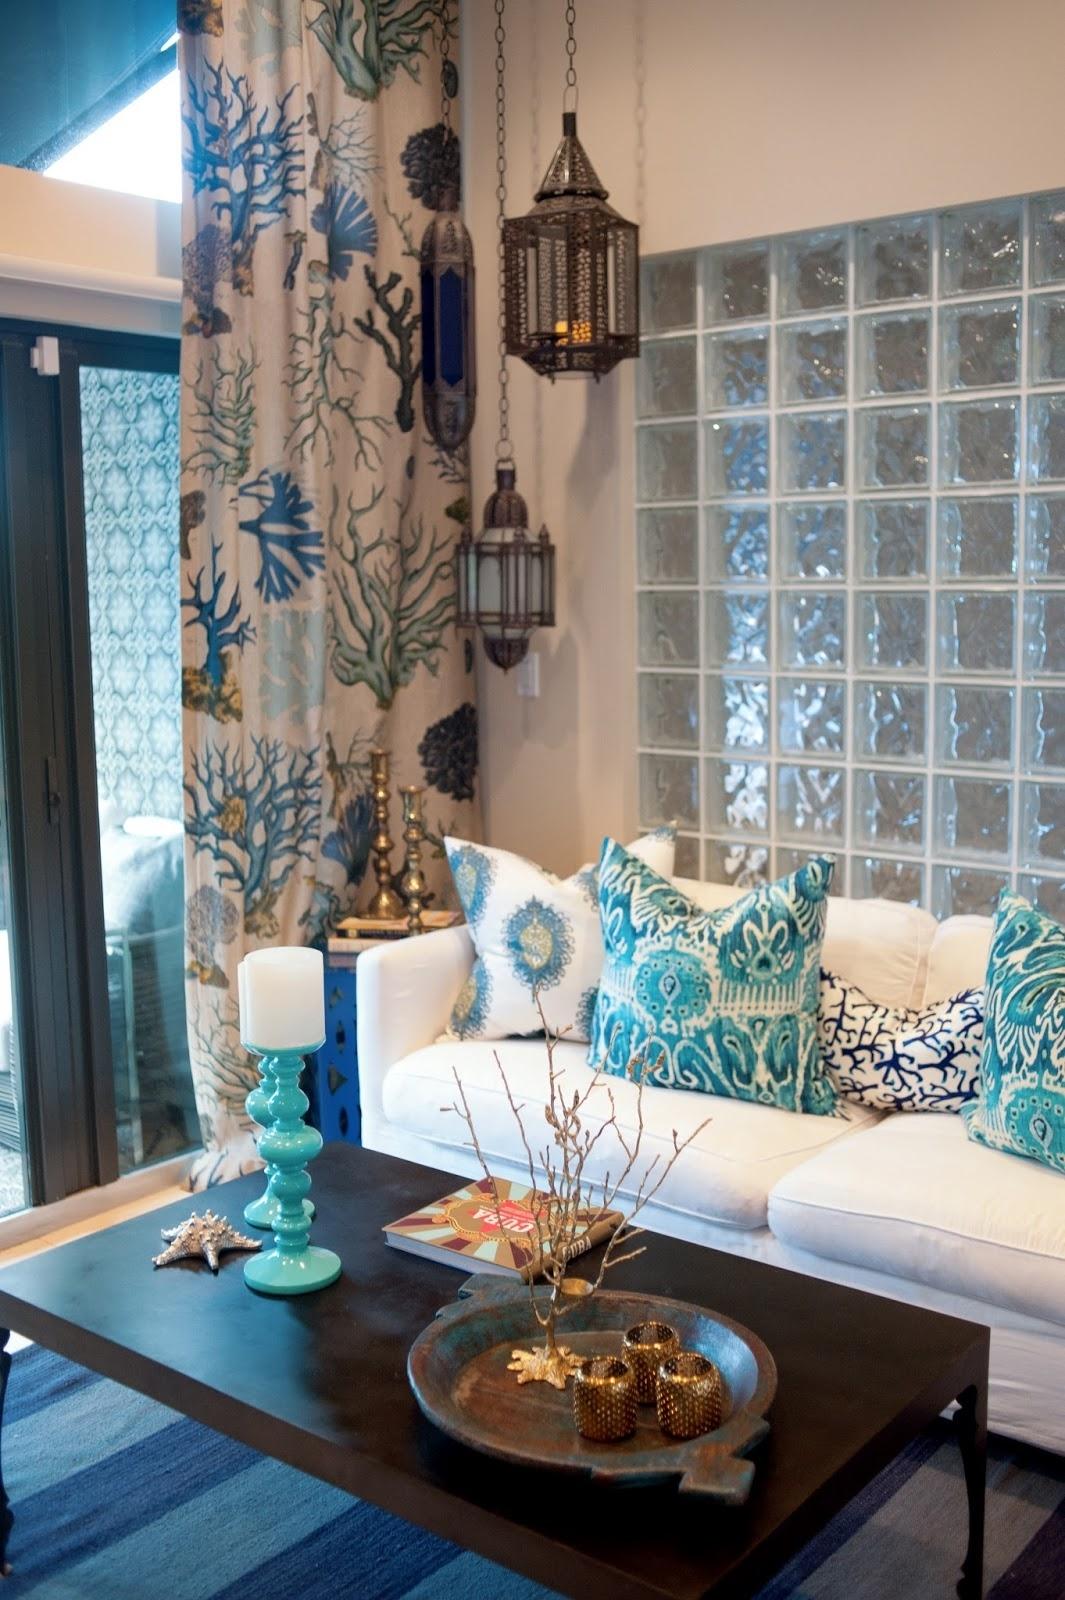 Emejing Hanging Lanterns Indoor Gallery – Decoration Design Ideas Throughout Outdoor Hanging Moroccan Lanterns (View 14 of 15)